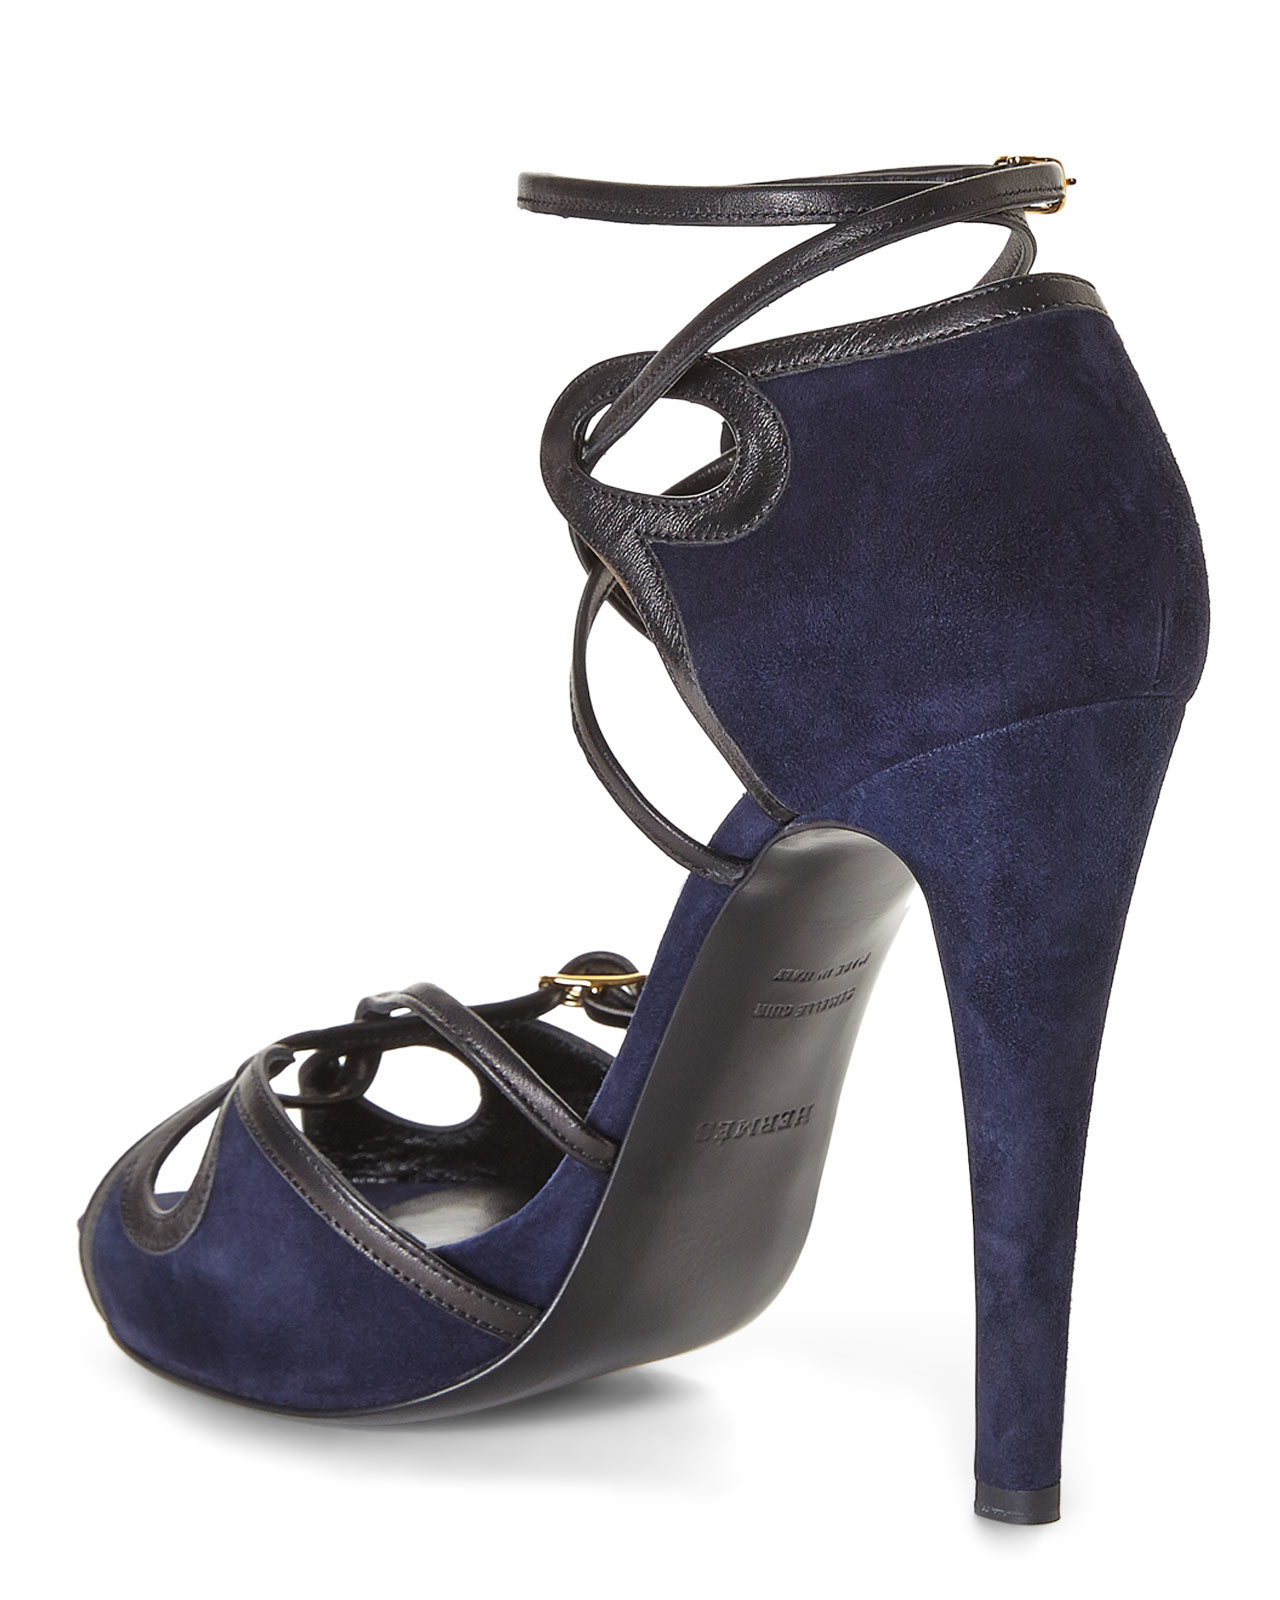 0f800c45231d Lyst - Hermès HermãˆS Strappy Platform Sandals in Blue